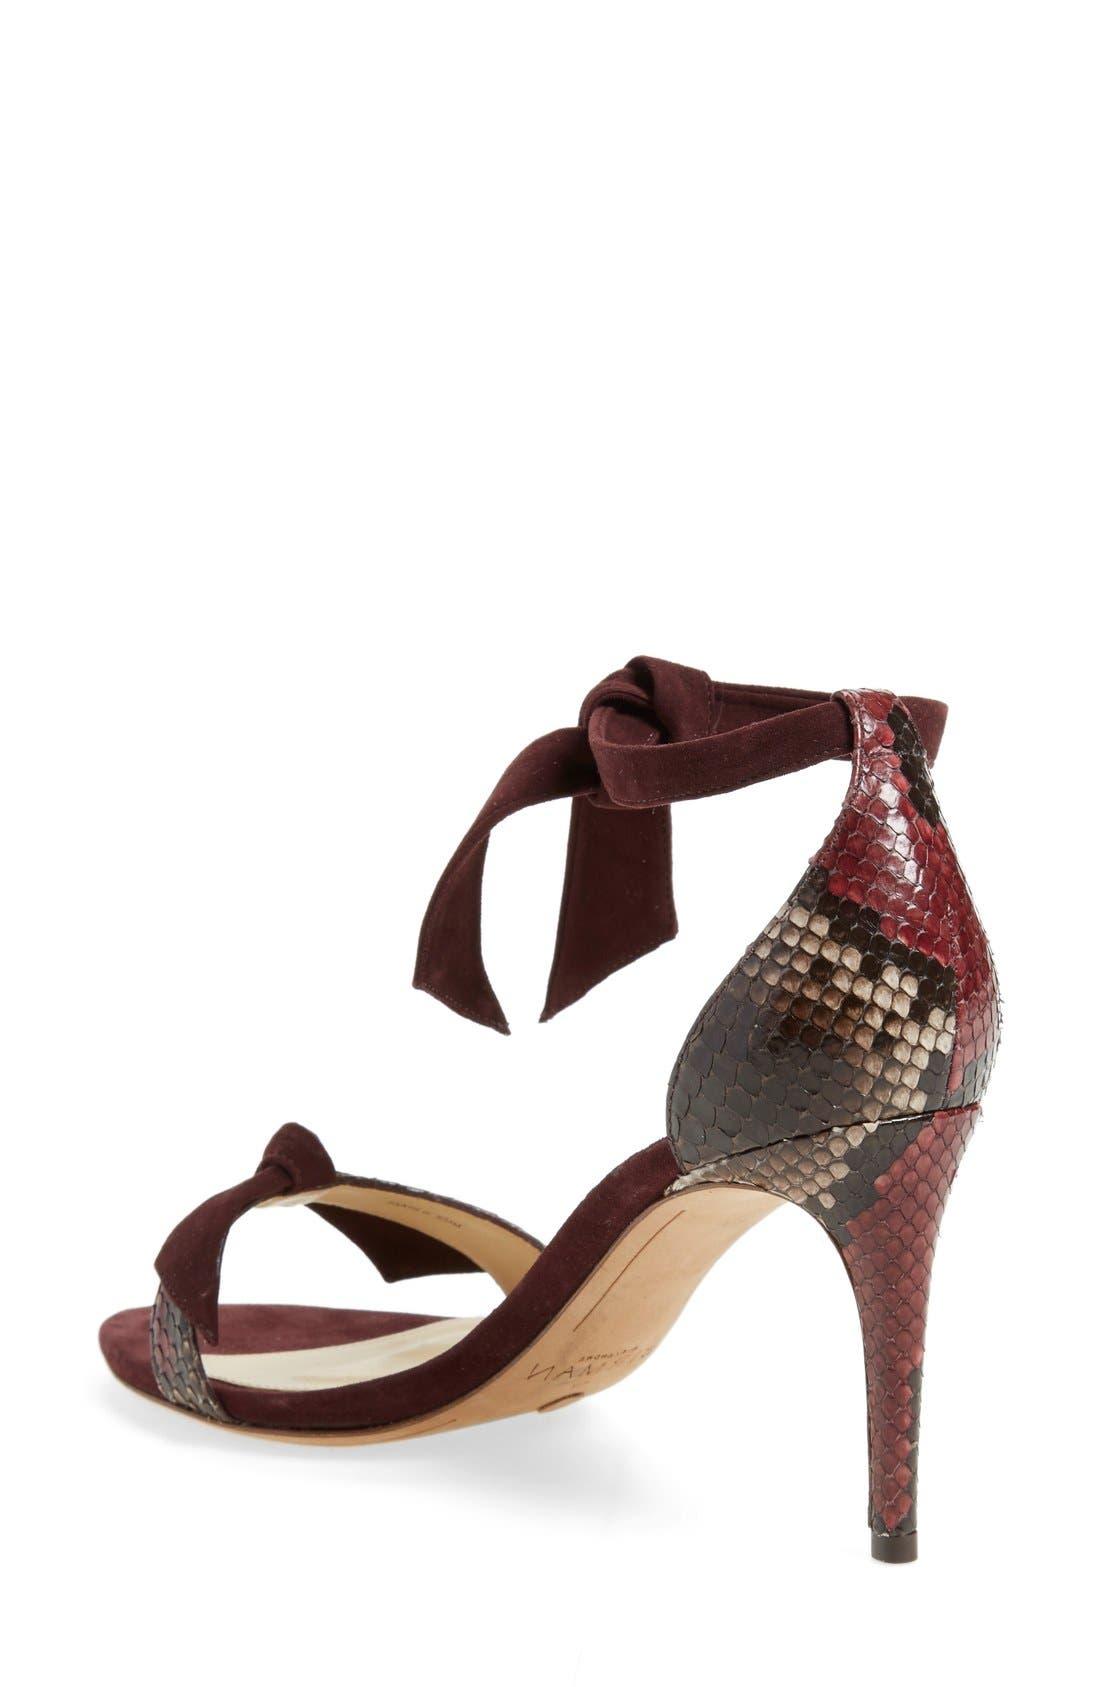 Alternate Image 2  - Alexandre Birman 'Clarita' Suede & Genuine Python Ankle Tie Sandal (Women) (Nordstrom Exclusive)